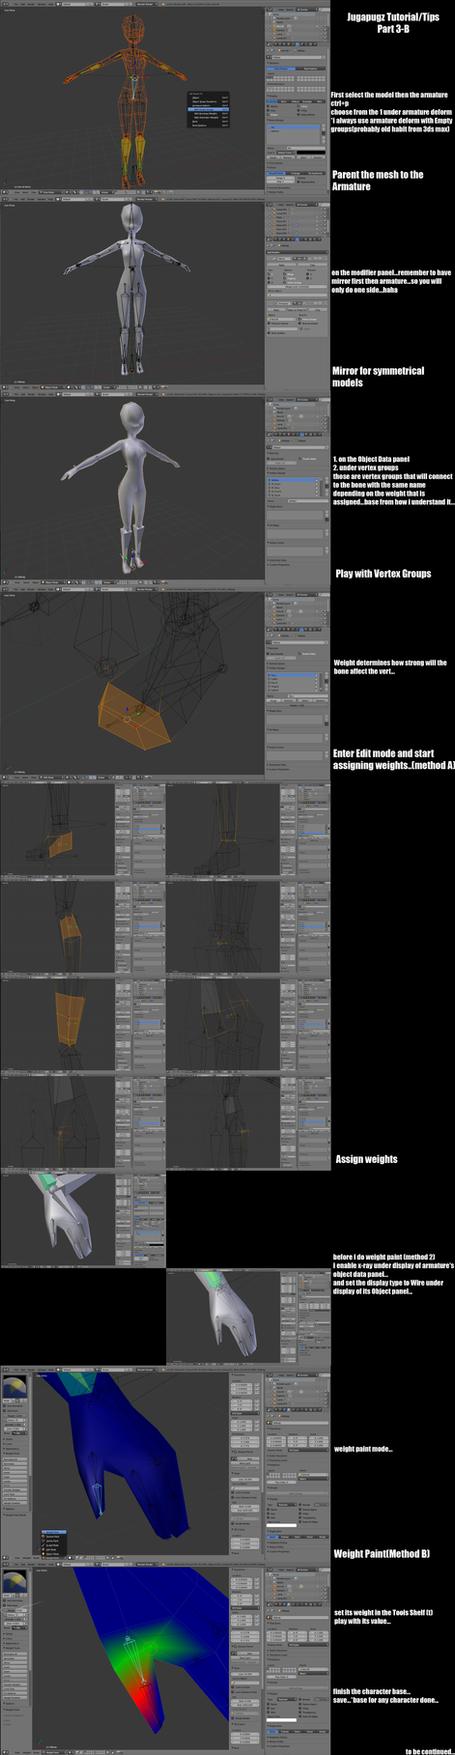 Jugapugz 3d lowpoly character Tutorial/Tip Part 3B by jugapugz